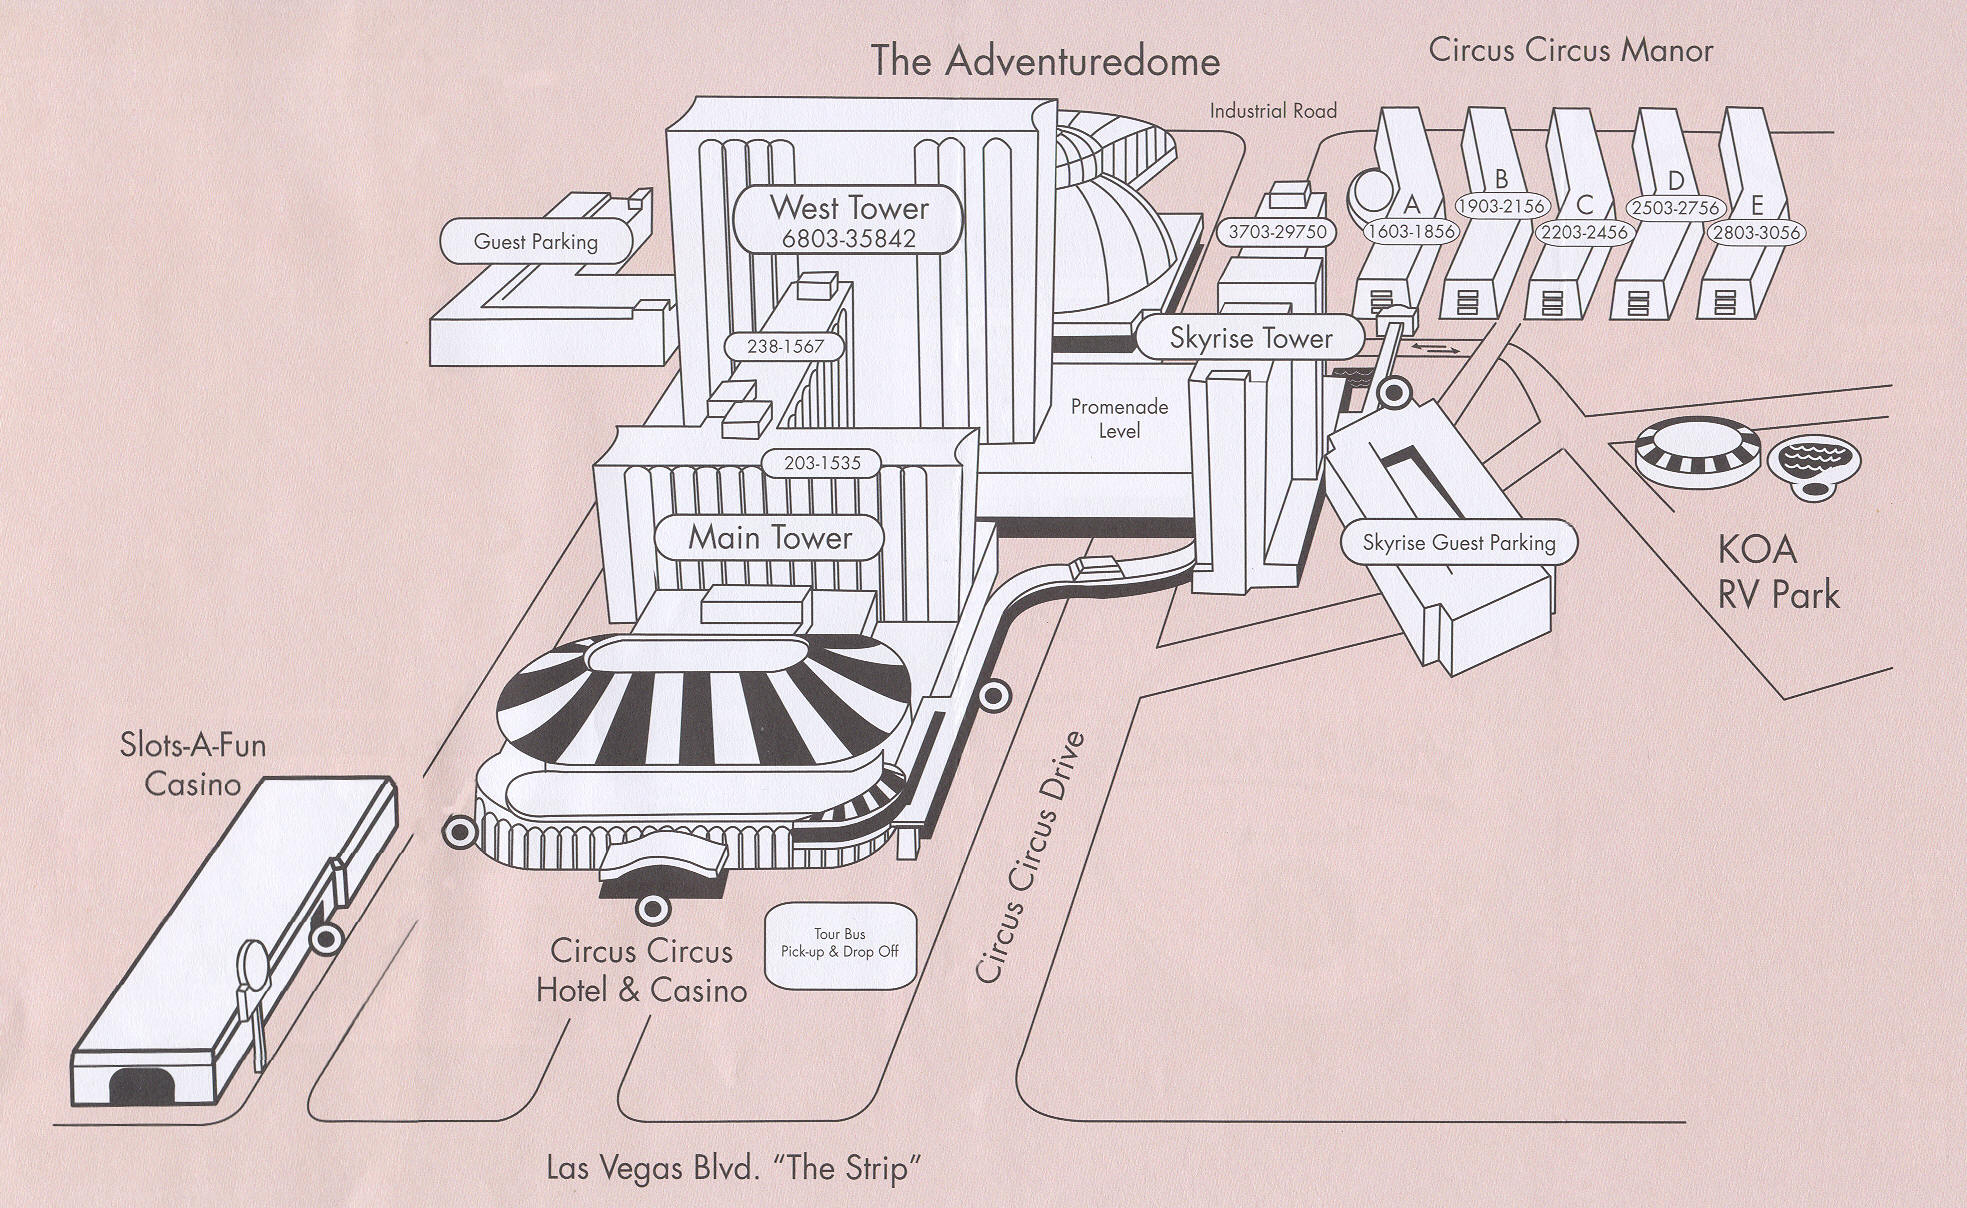 Circus Circus Hotel Map Circus Circus Map - Map of las vegas venetian